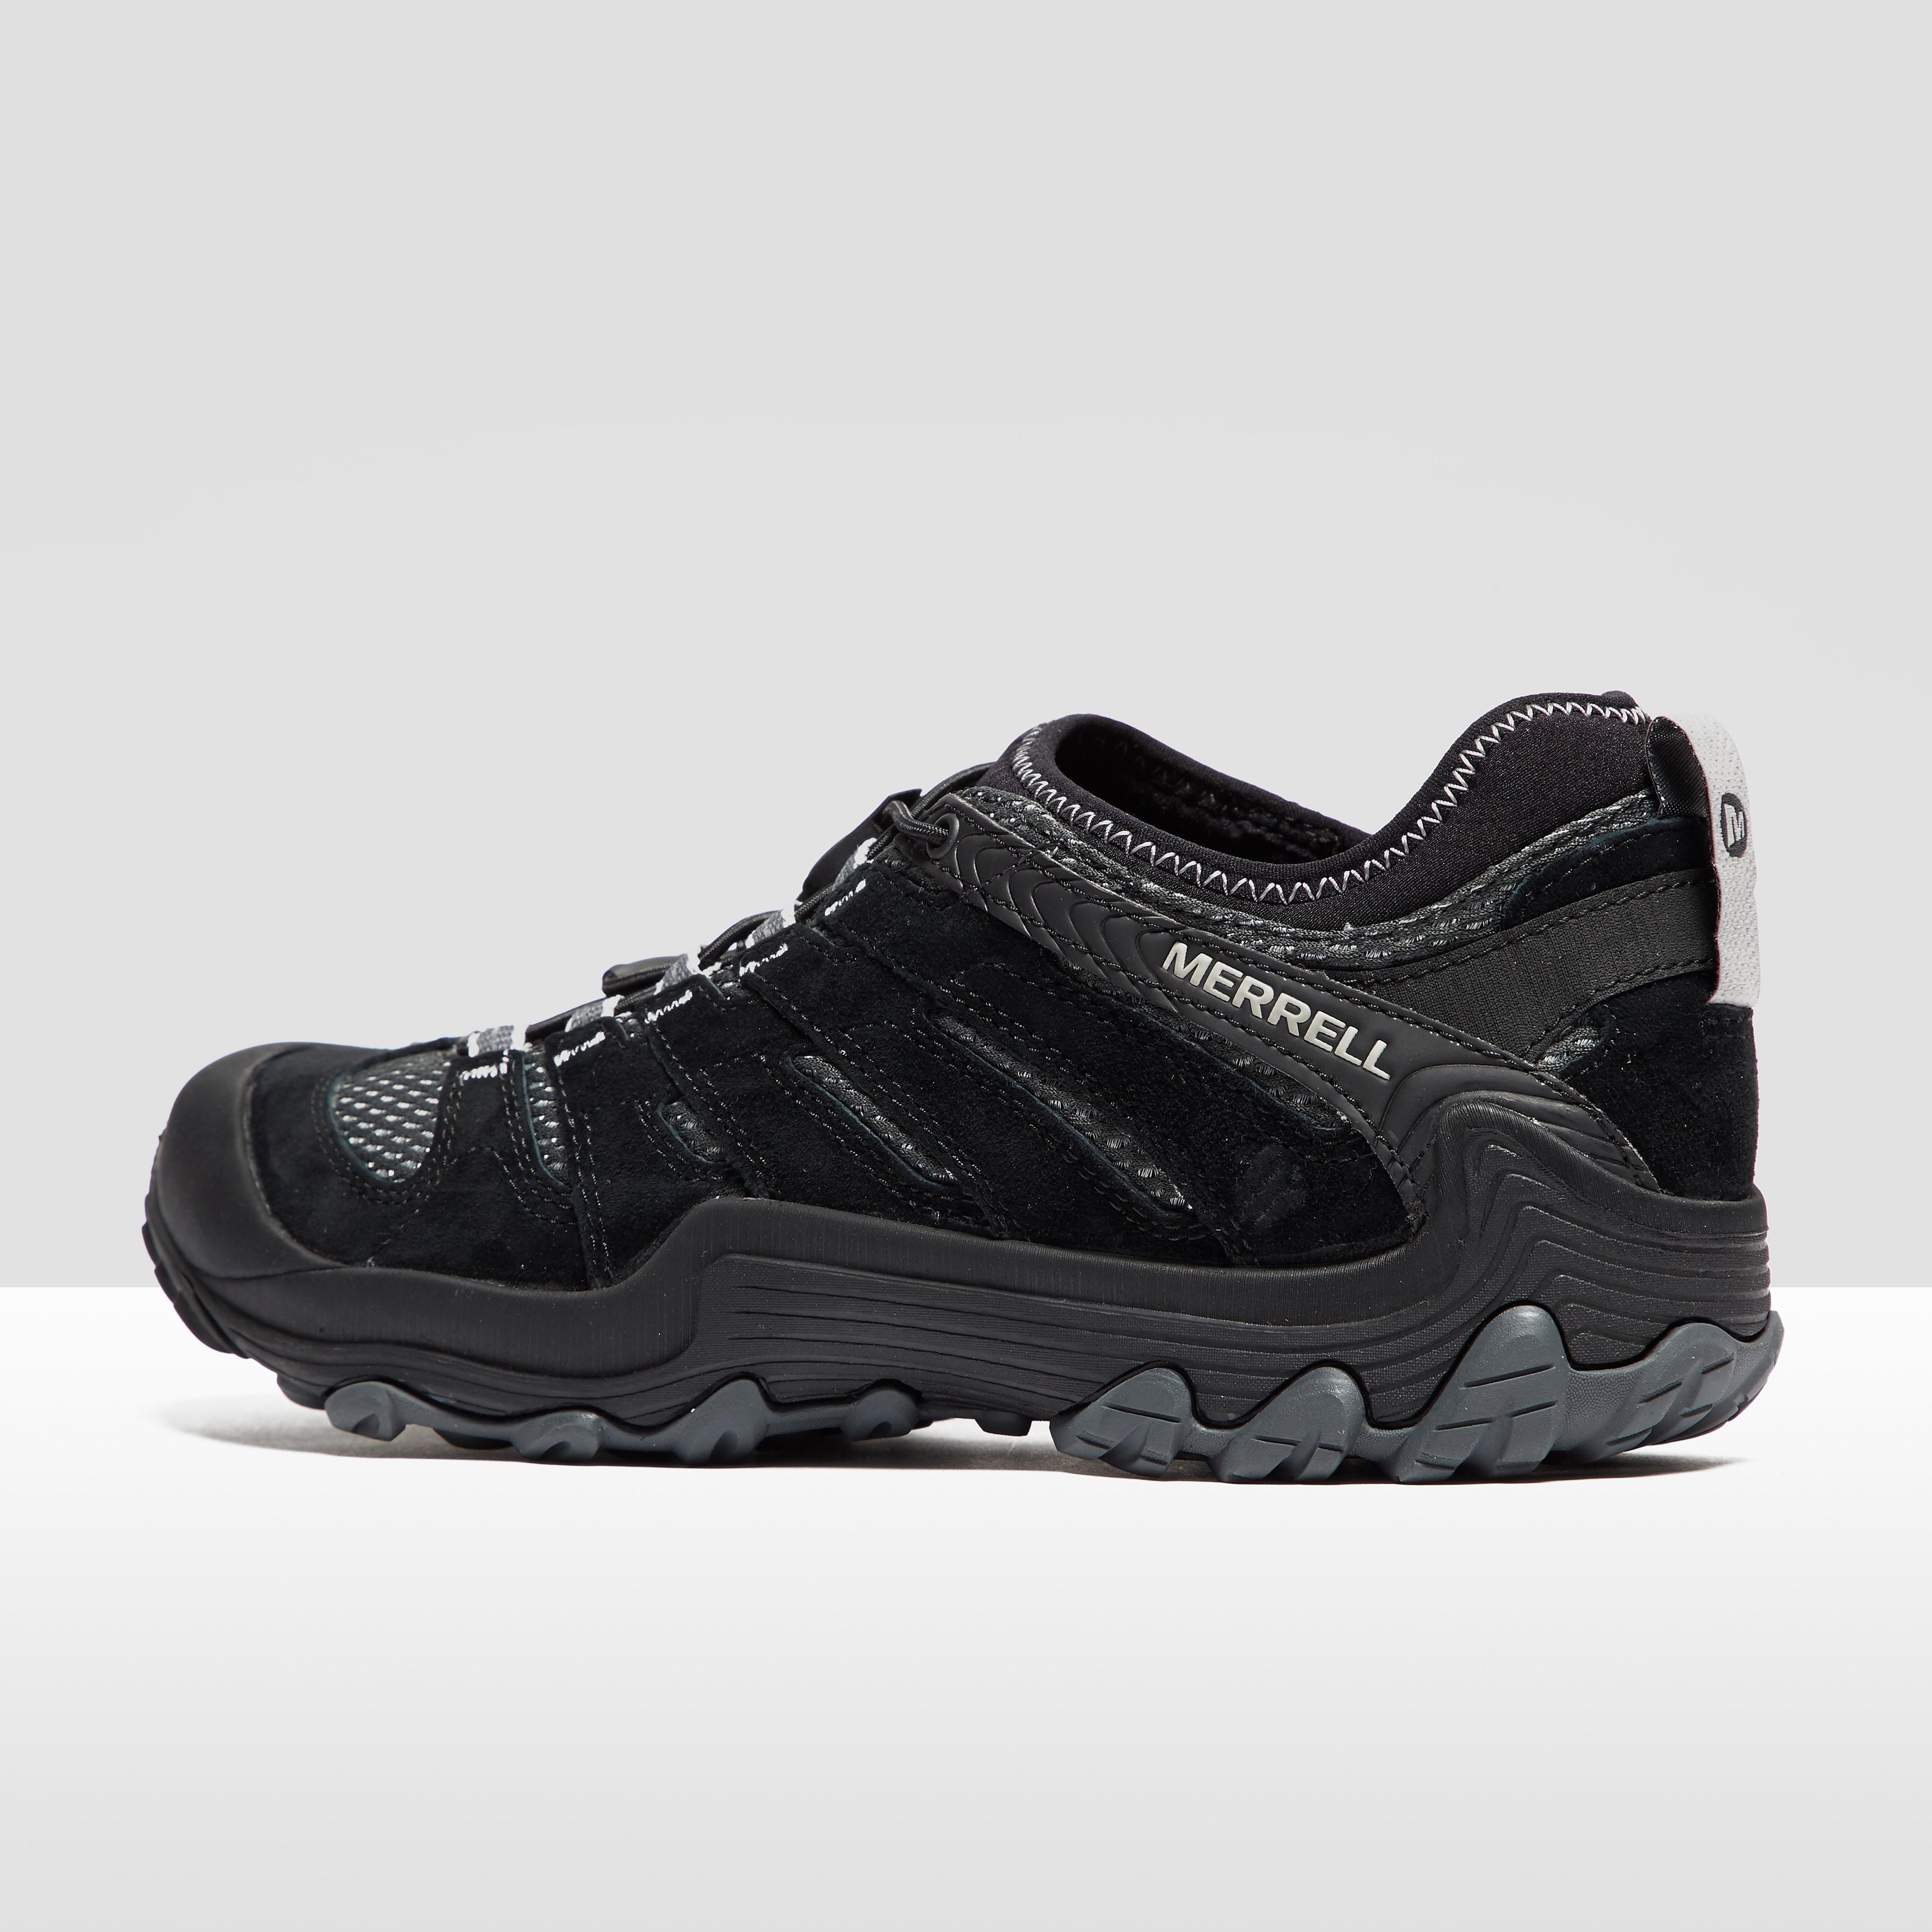 Merrell Chameleon 7 Limit Men's Walking Shoes